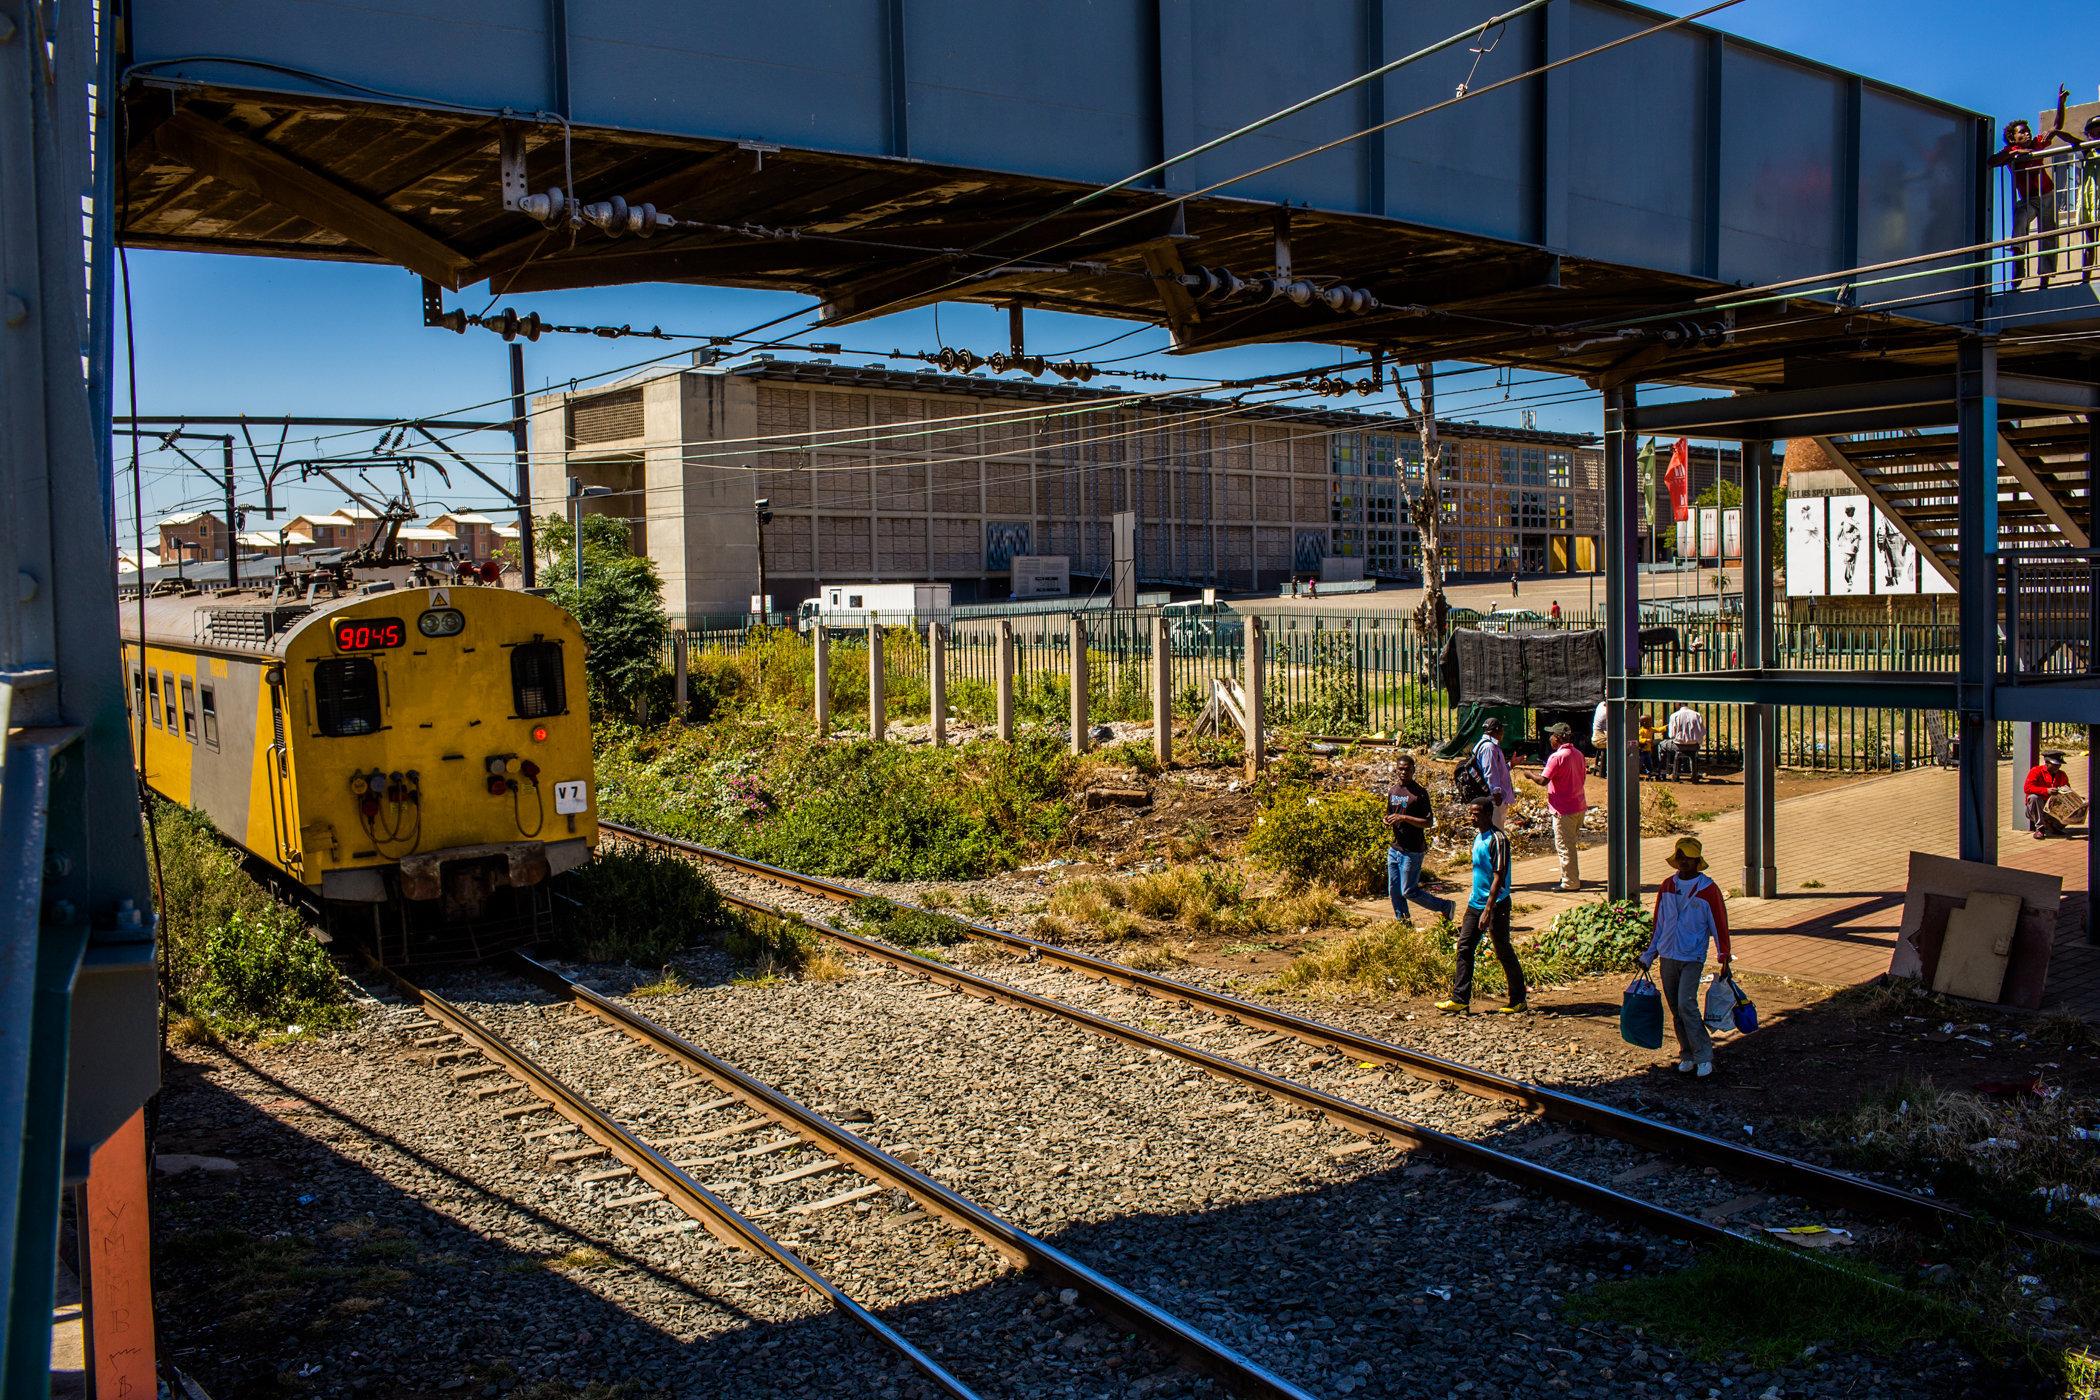 Soweto_Street_railcrossing-0839.jpg